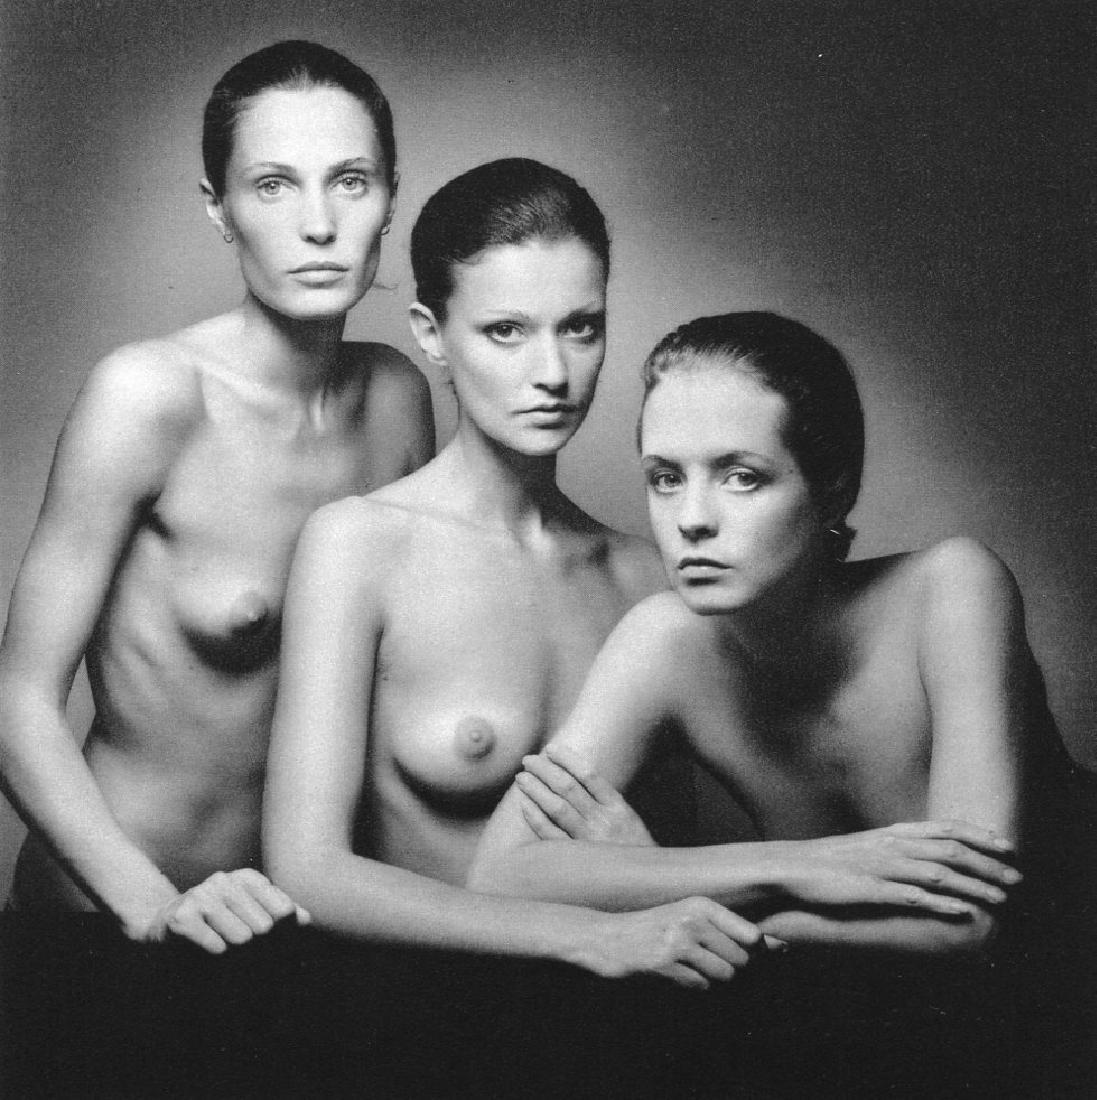 JEANLOUP SIEFF - Group Portrait for Perfume ad, Paris